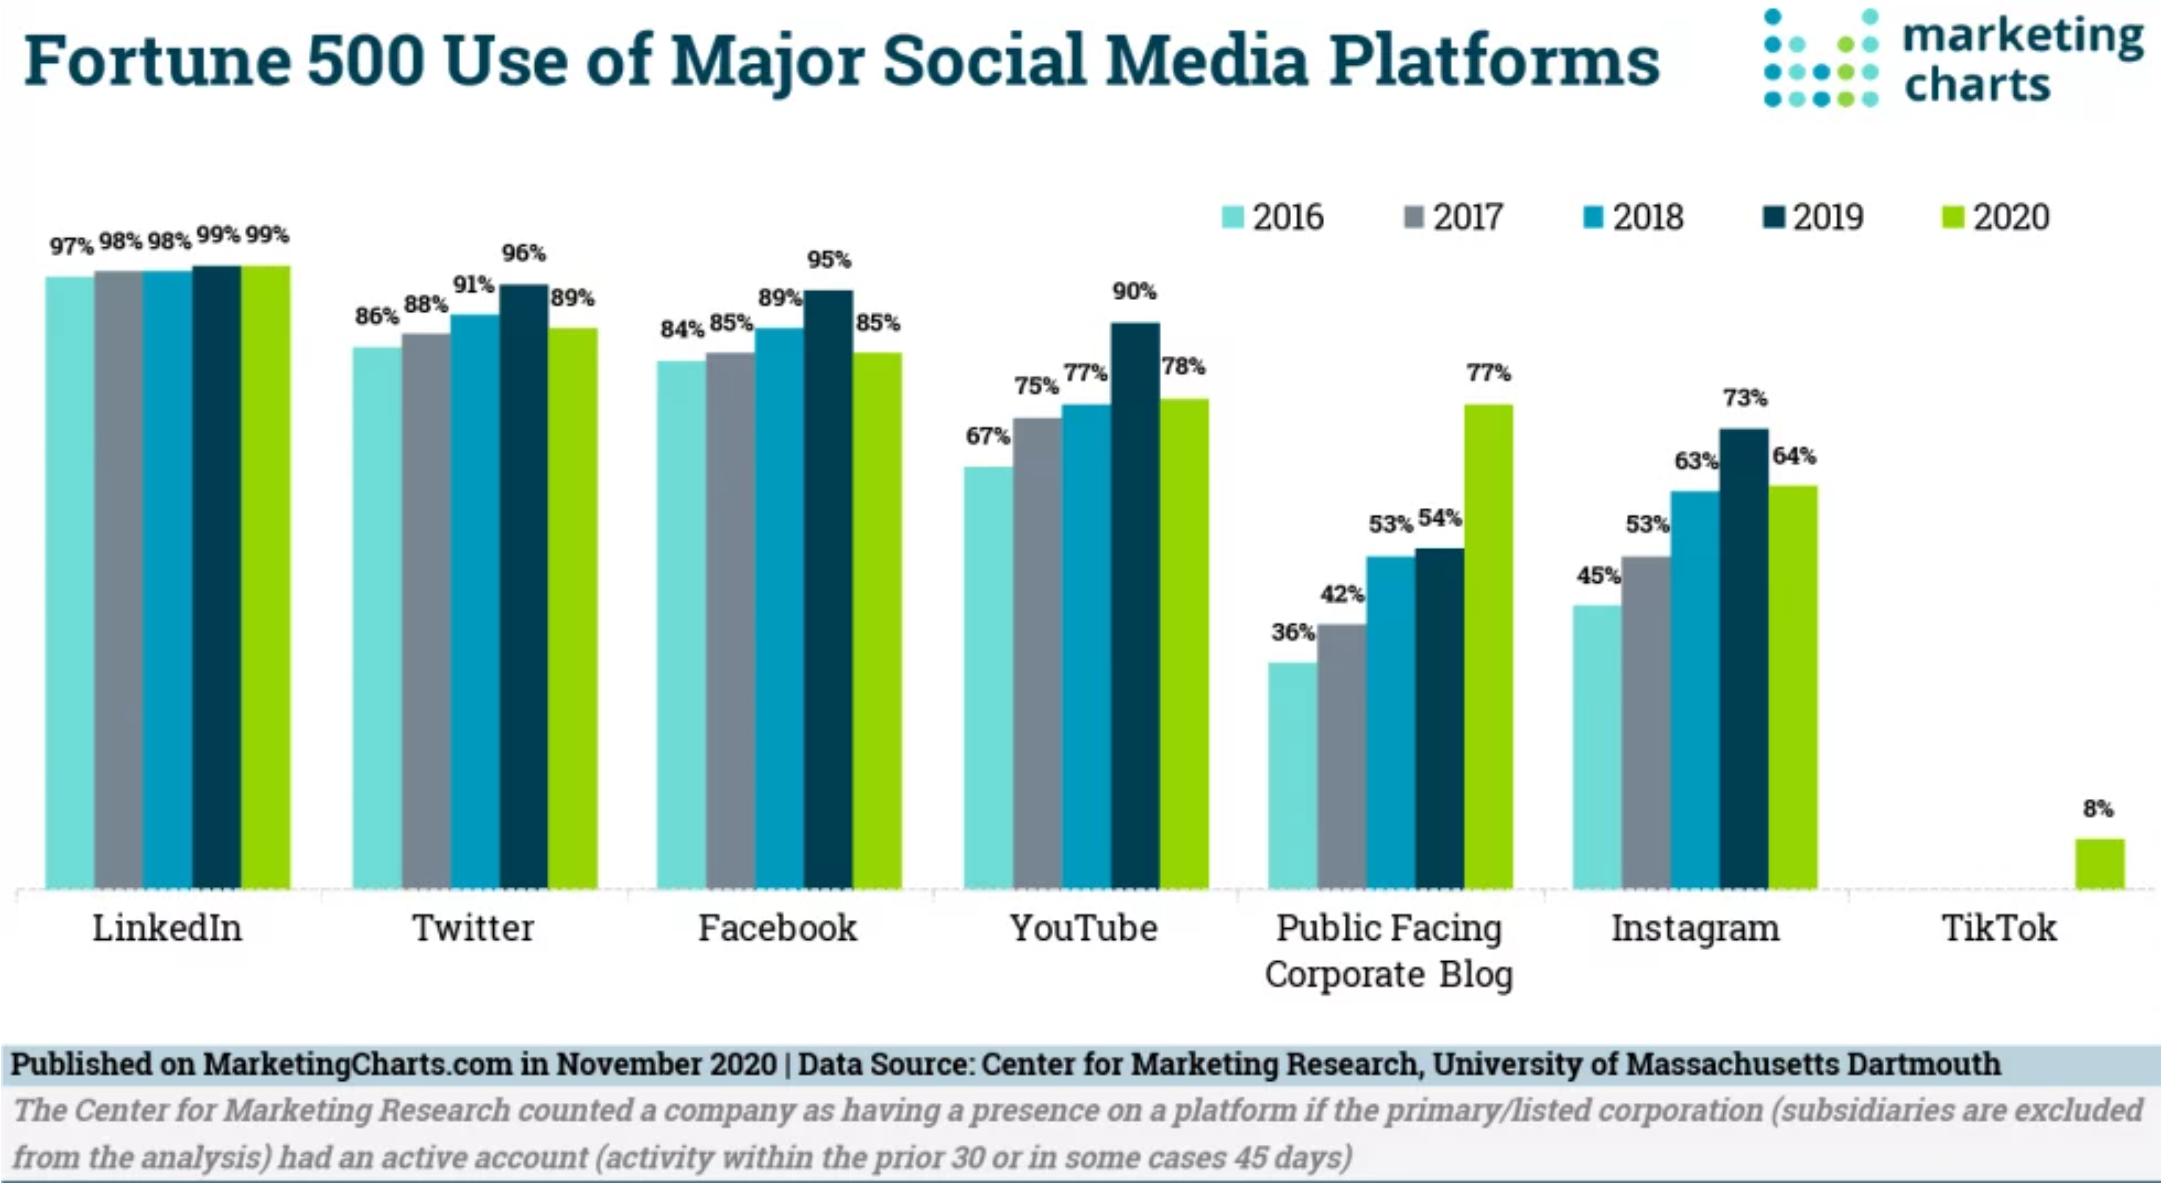 How Fortunte 500 Companies Use Social Media